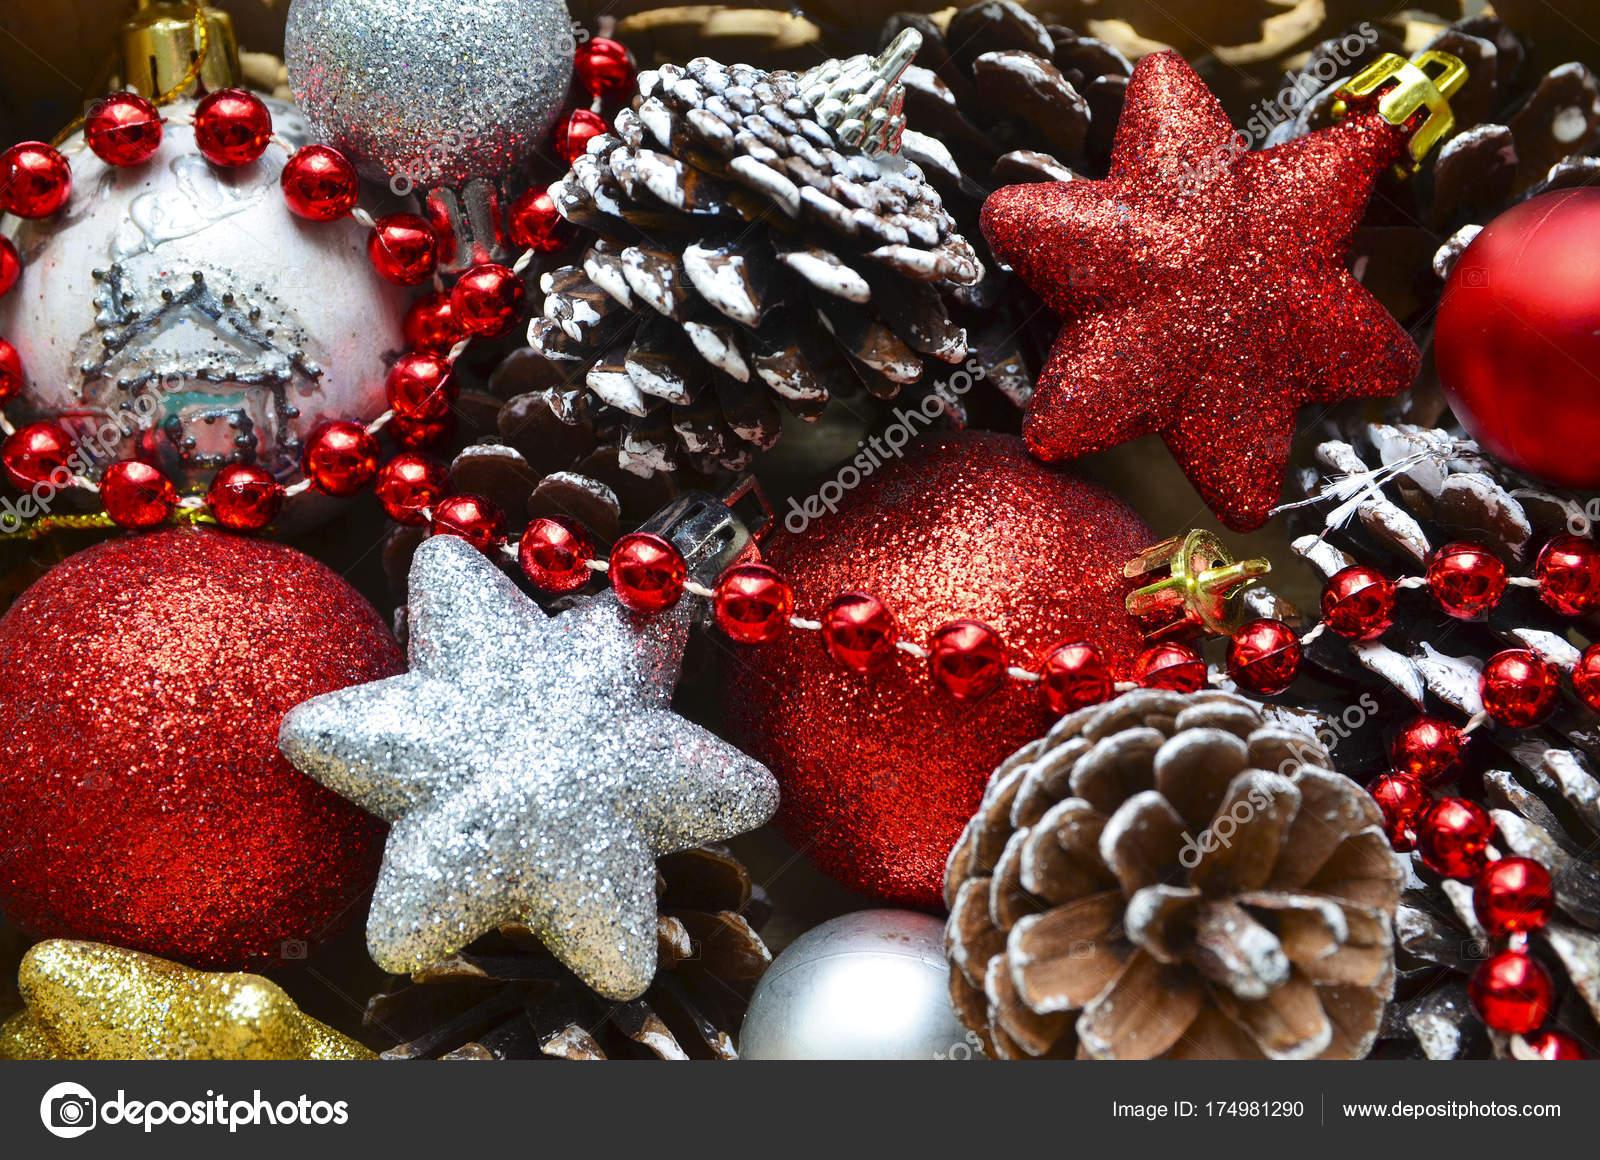 Christmas Tree Decoration Red Silver Shiny Balls Stars Pine Cones Stock Photo C Severinova 174981290